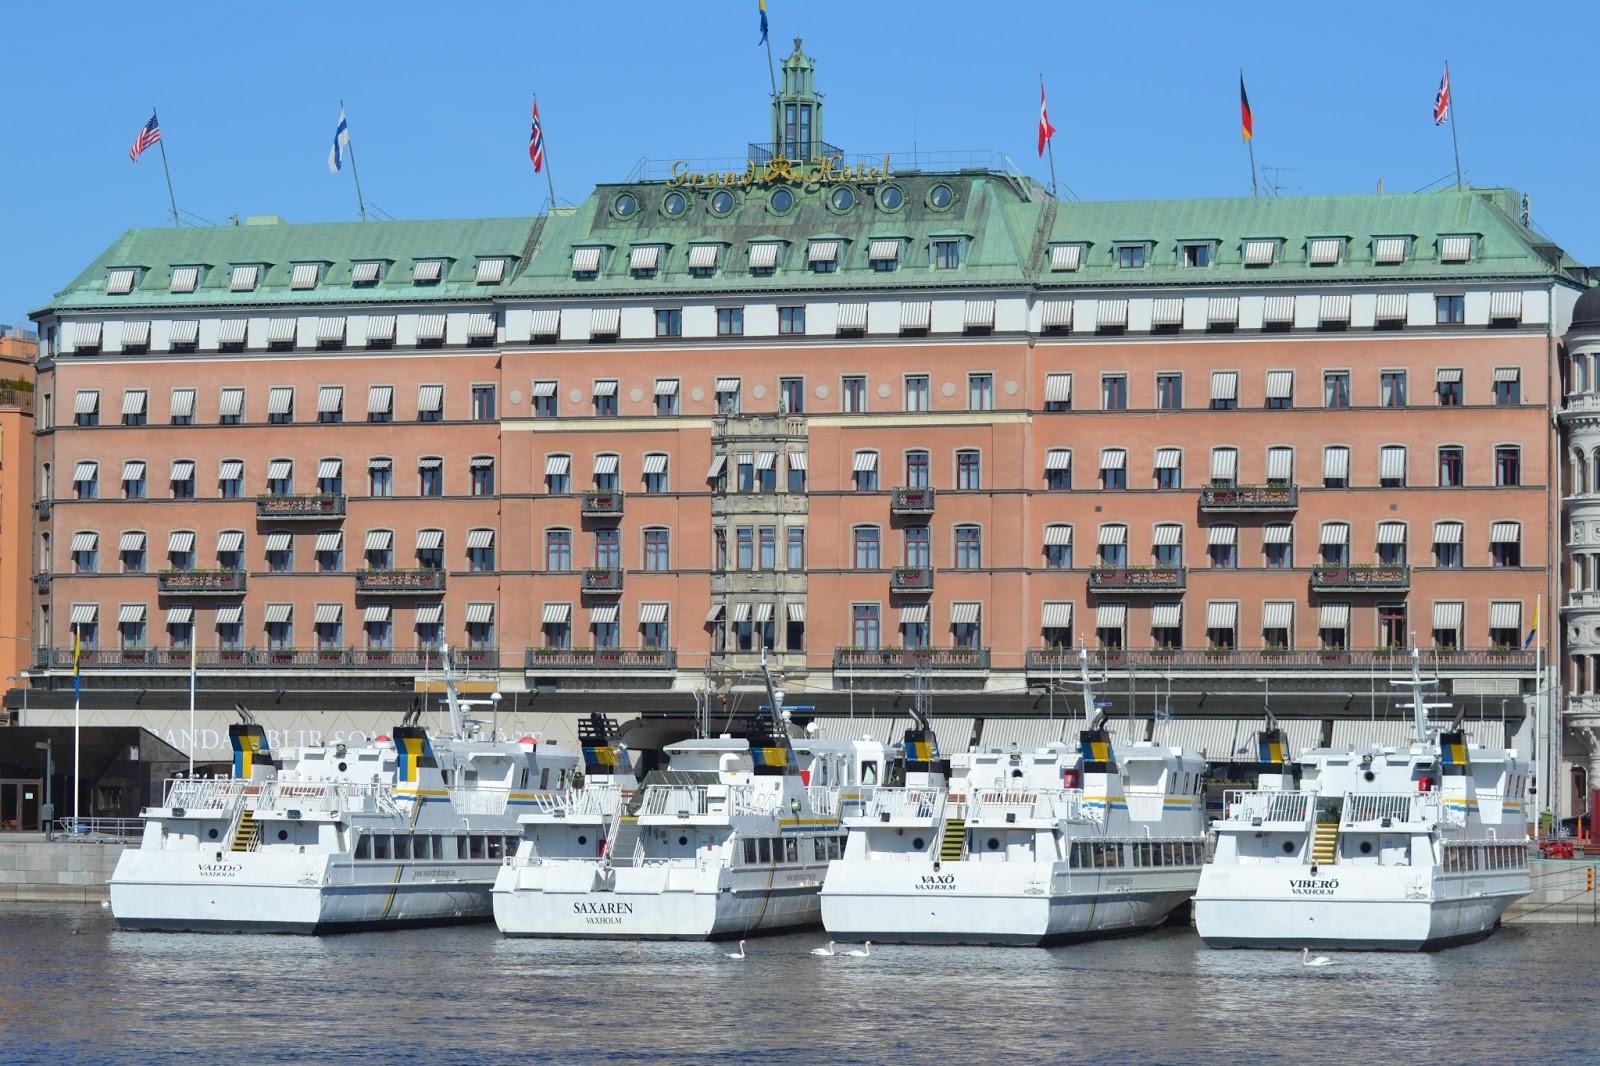 Grand Hotel Stockholm Smorgasbord